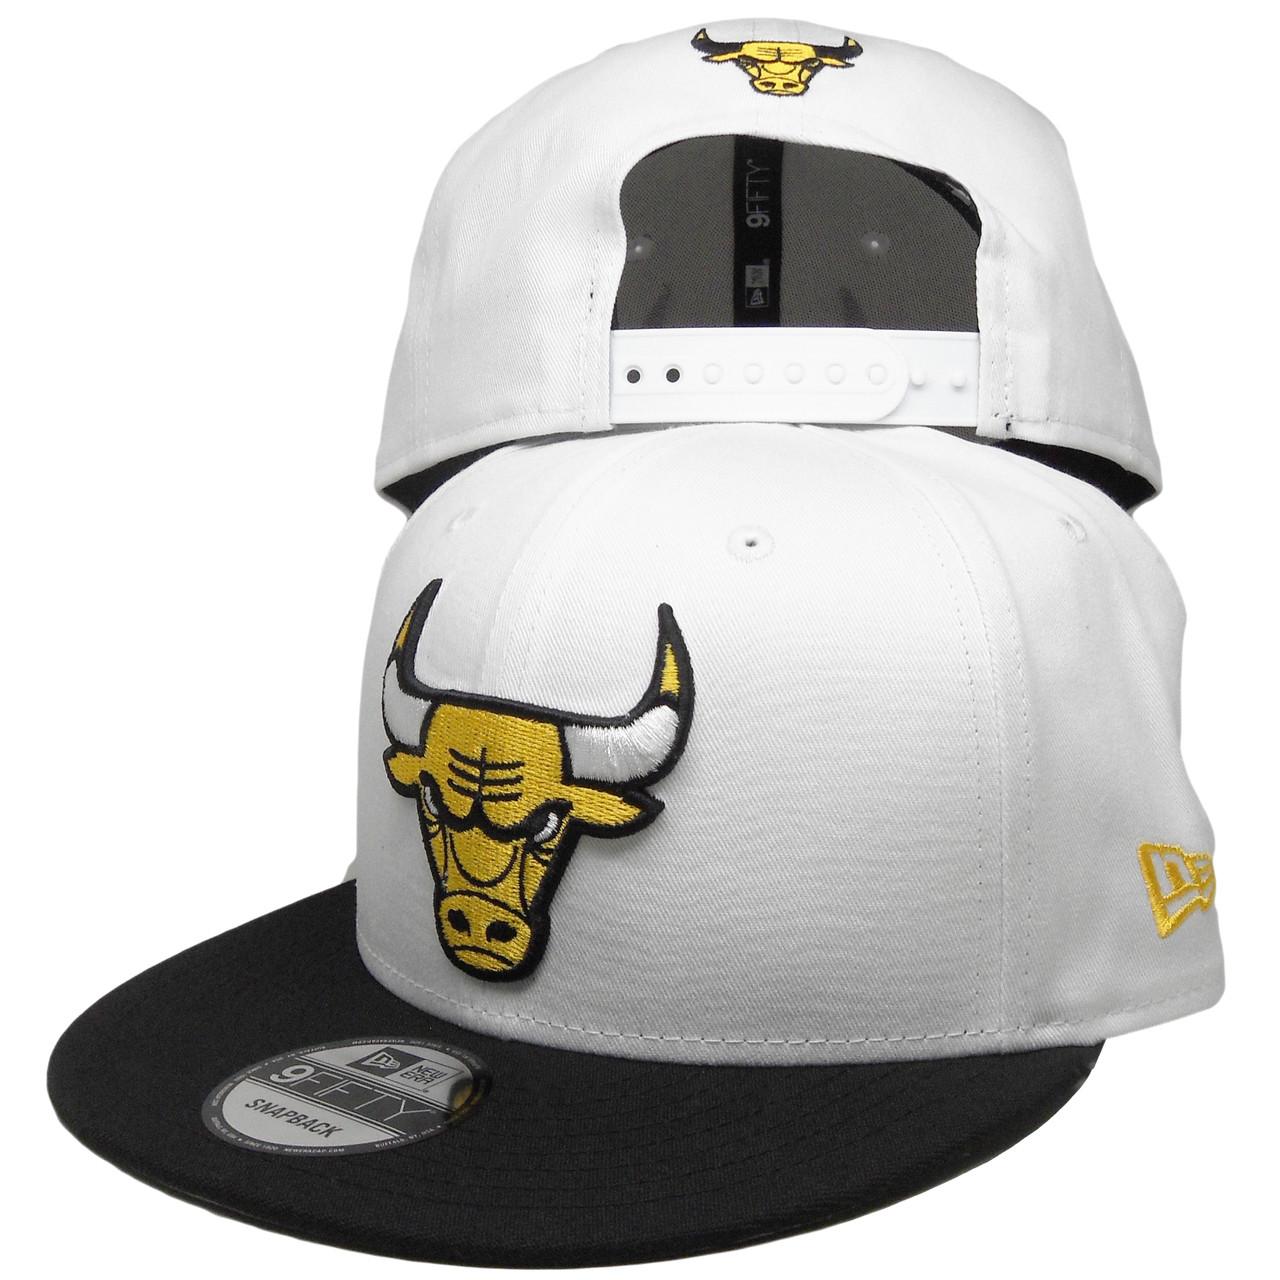 buy popular 0be22 cb7fa Chicago Bulls New Era Custom 9Fifty Snapback Hat - White, Black, Yellow -  ECapsUnlimited.com